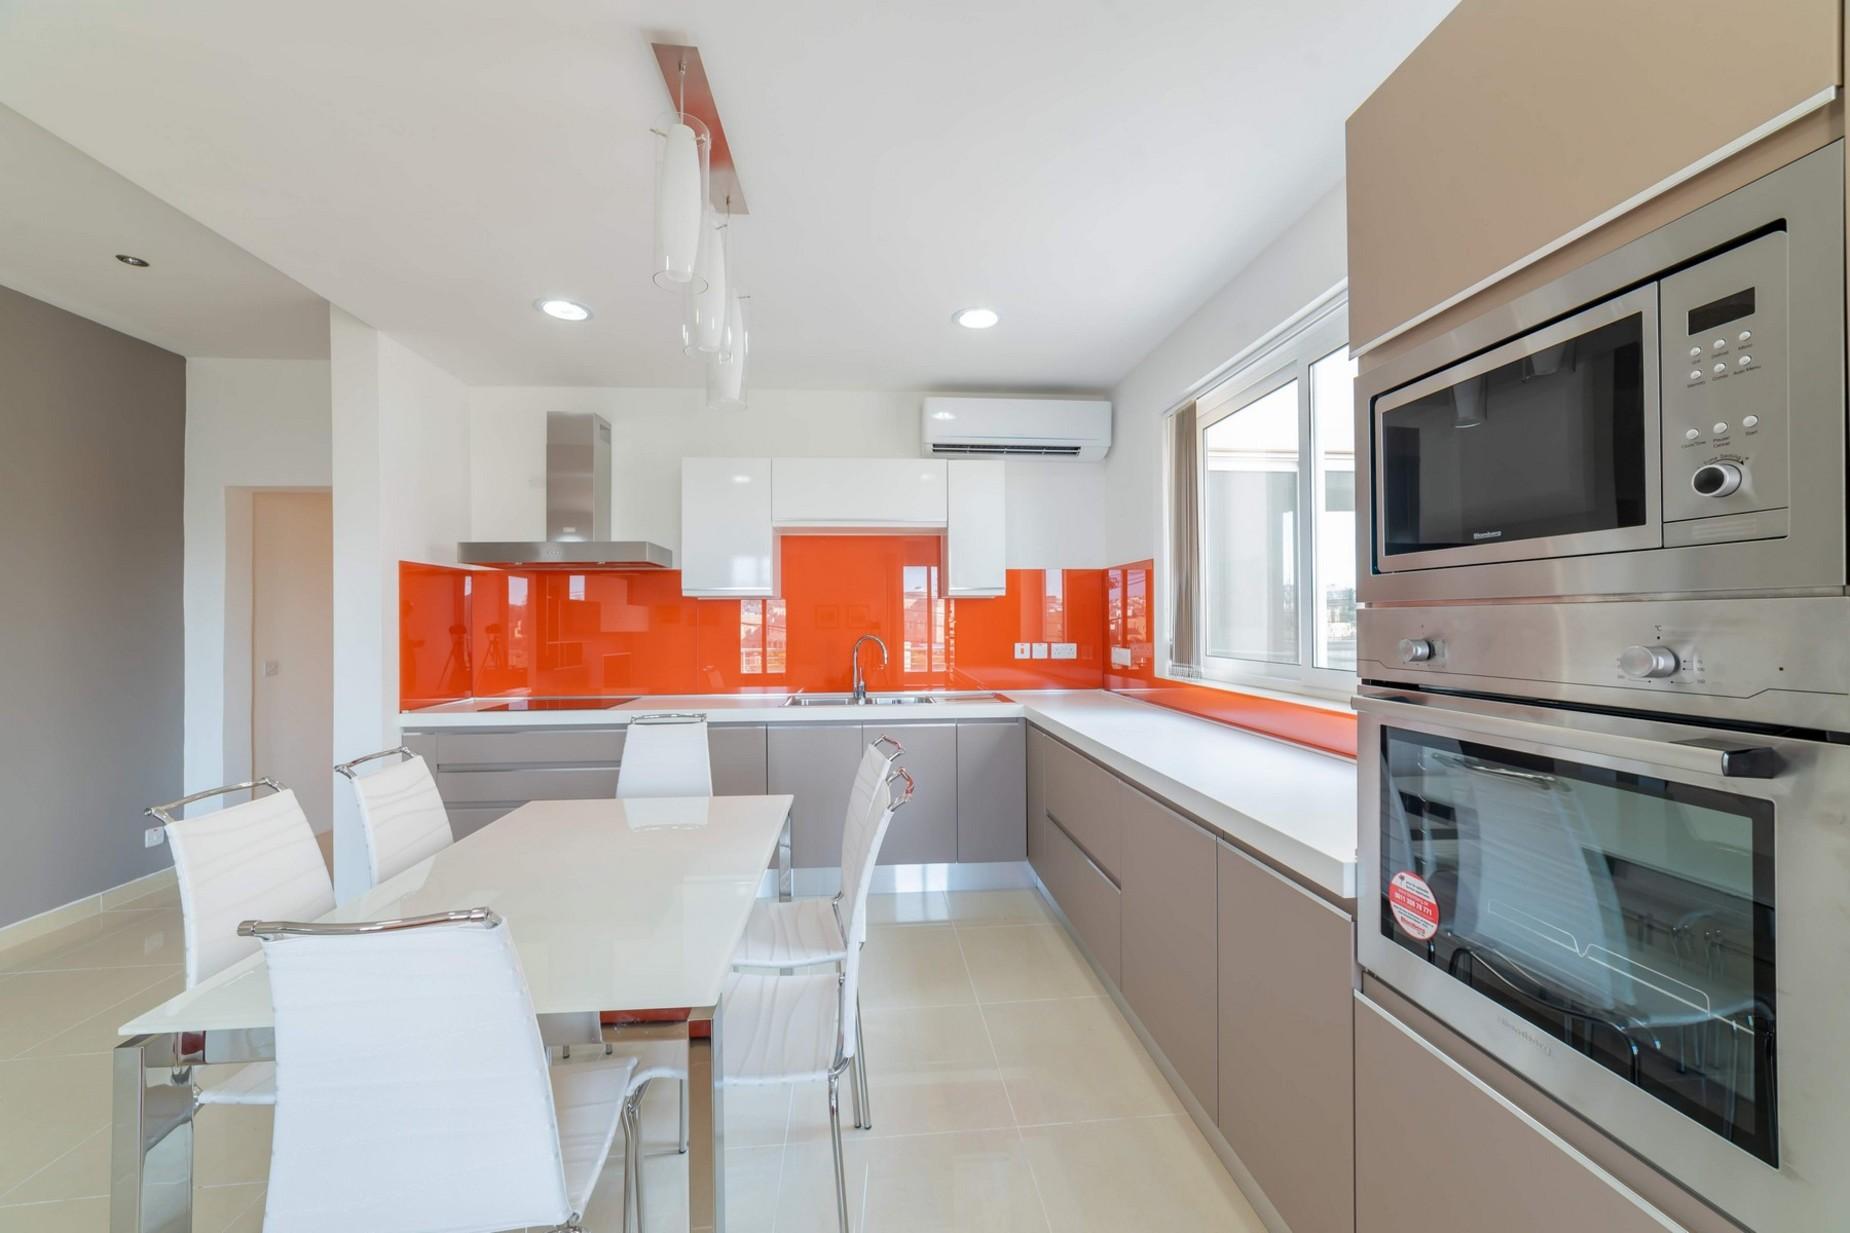 3 bed Apartment For Rent in Balzan, Balzan - thumb 6